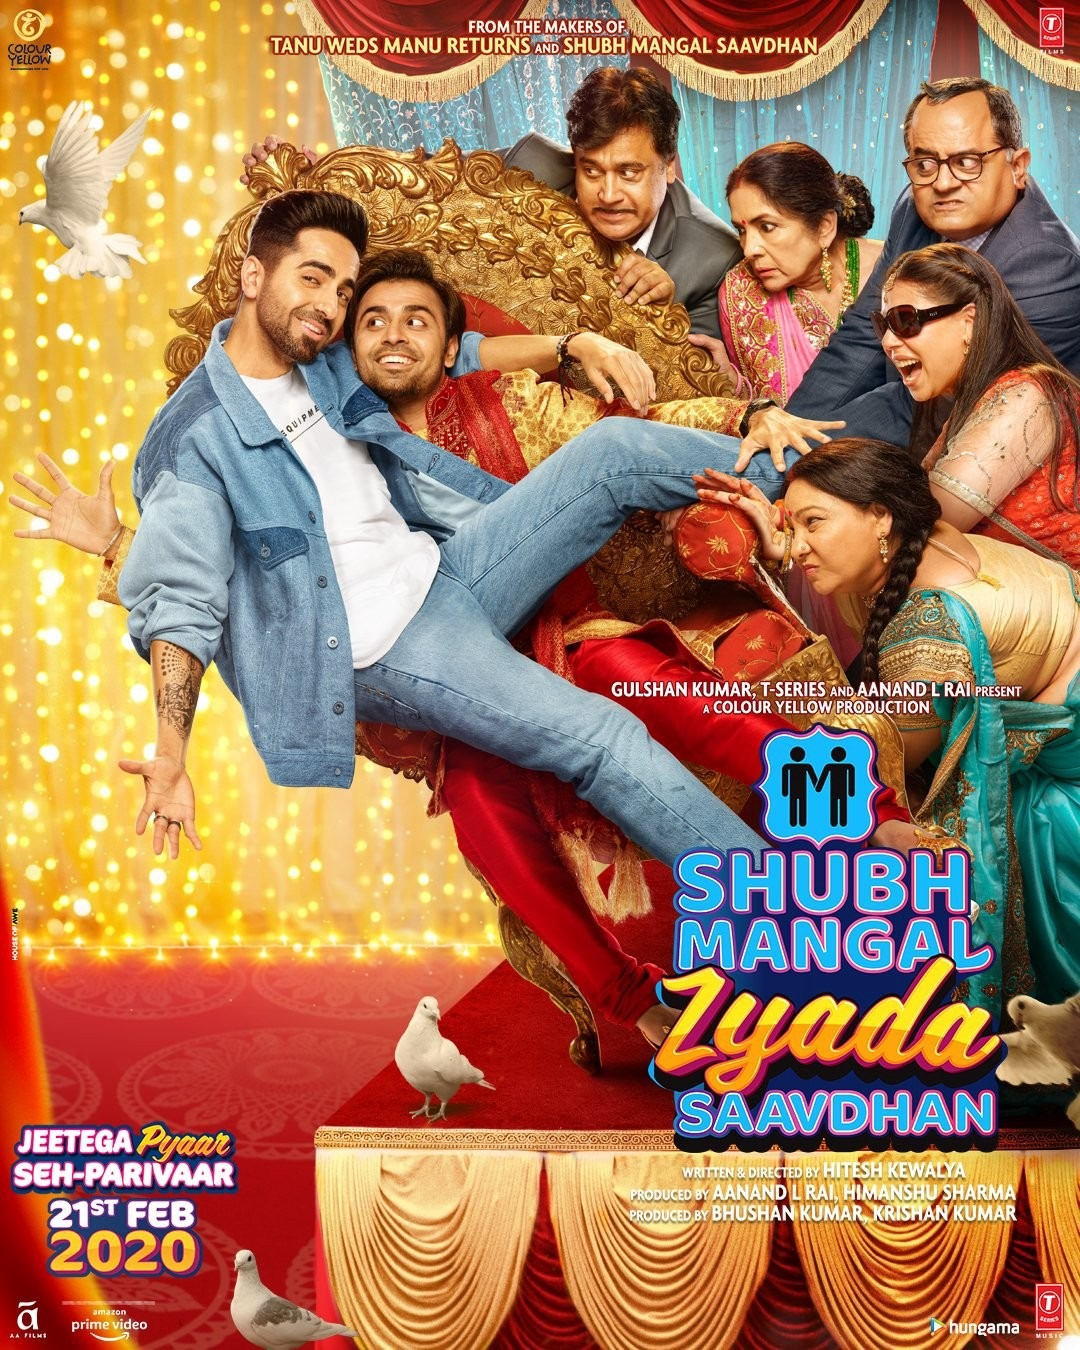 Shubh Mangal Zyada Saavdhan 2020 movie